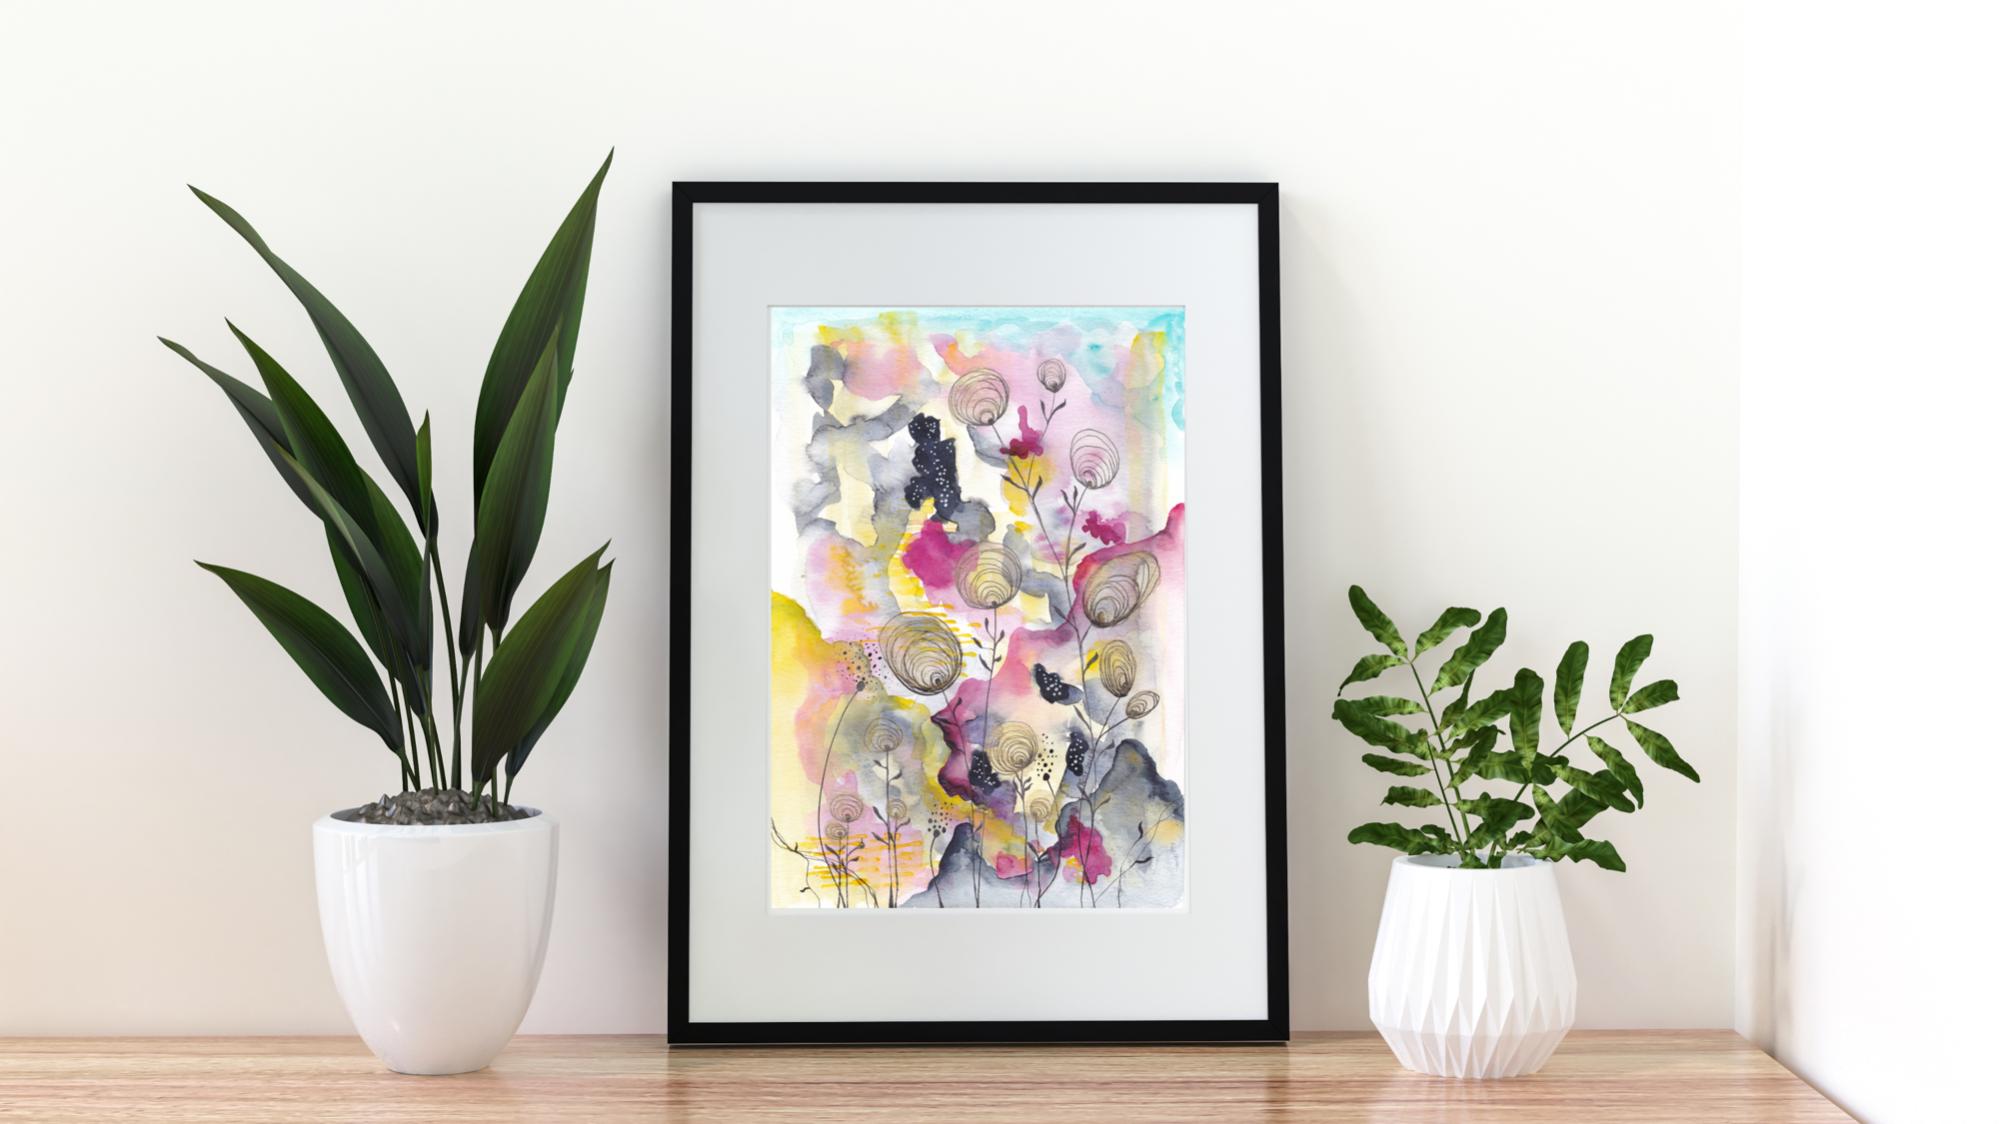 'Enchanted Garden' Watercolour Art by Stacey-Ann Cole